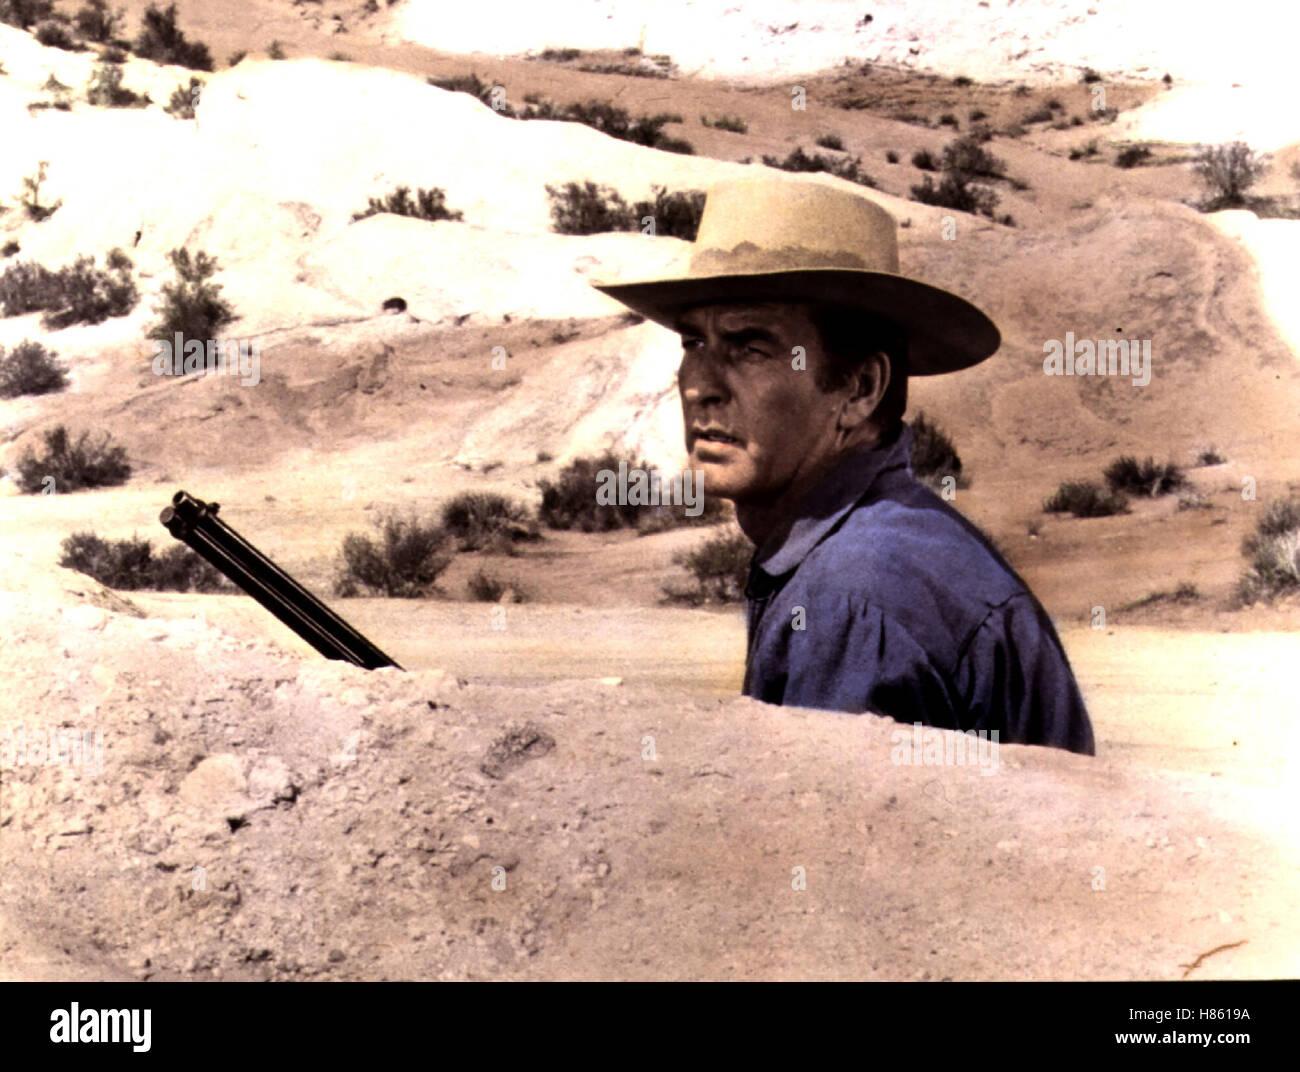 Texas Desperados W Estern Sheriff Gid George Montgomery Hat Stock Photo Alamy